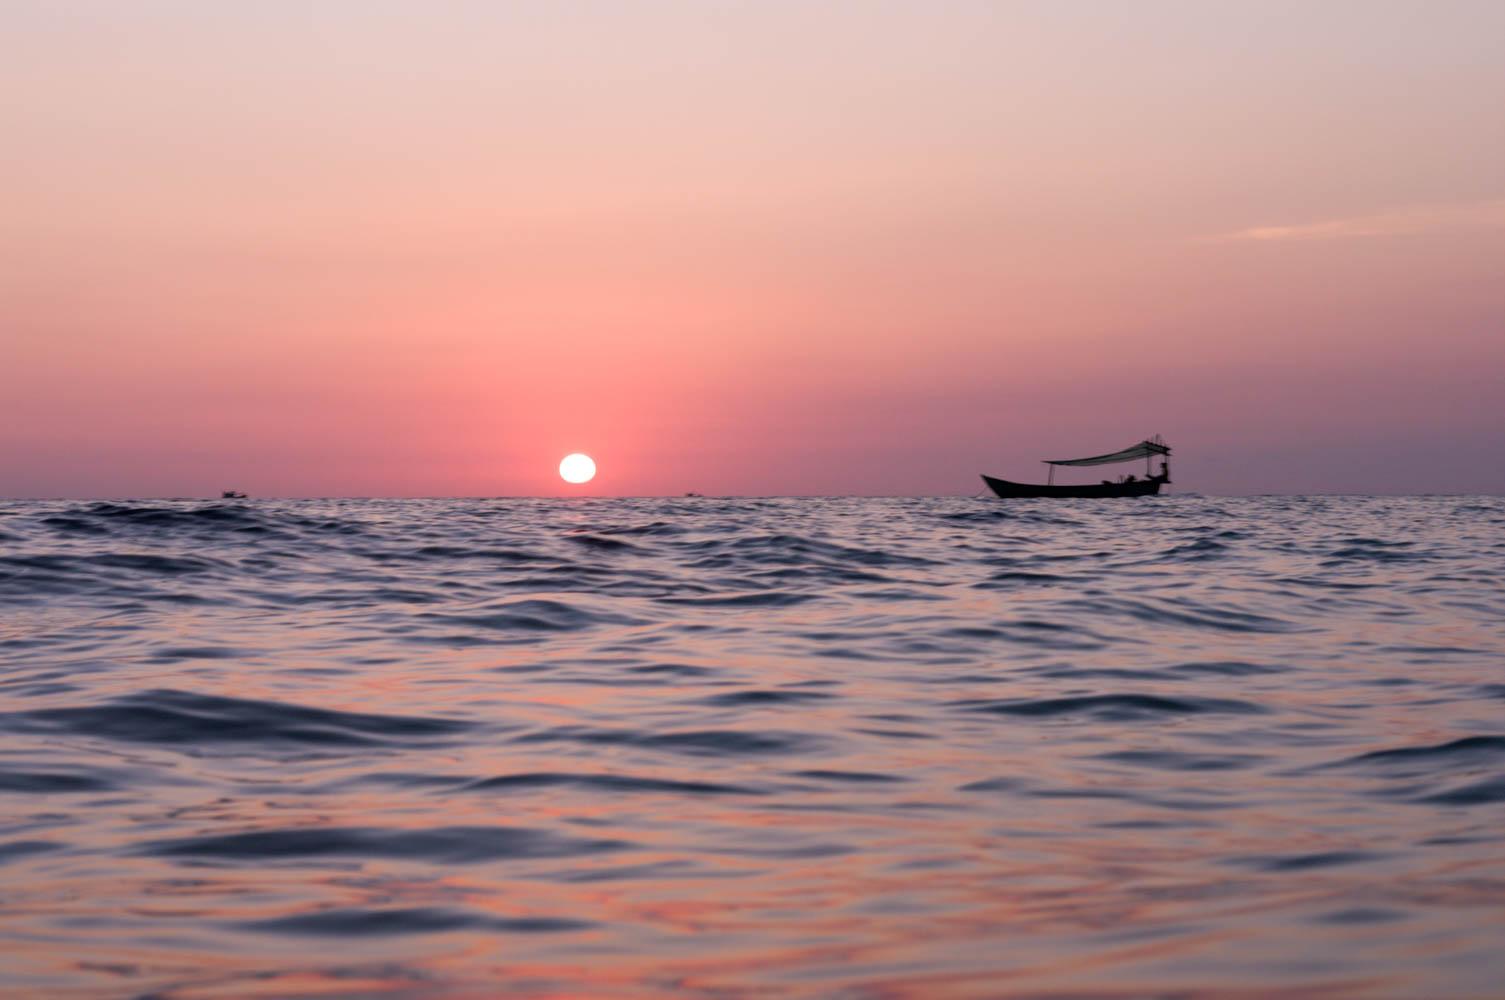 Sunset over ocean at sunset beach, Koh Rong Samloem, Cambodia